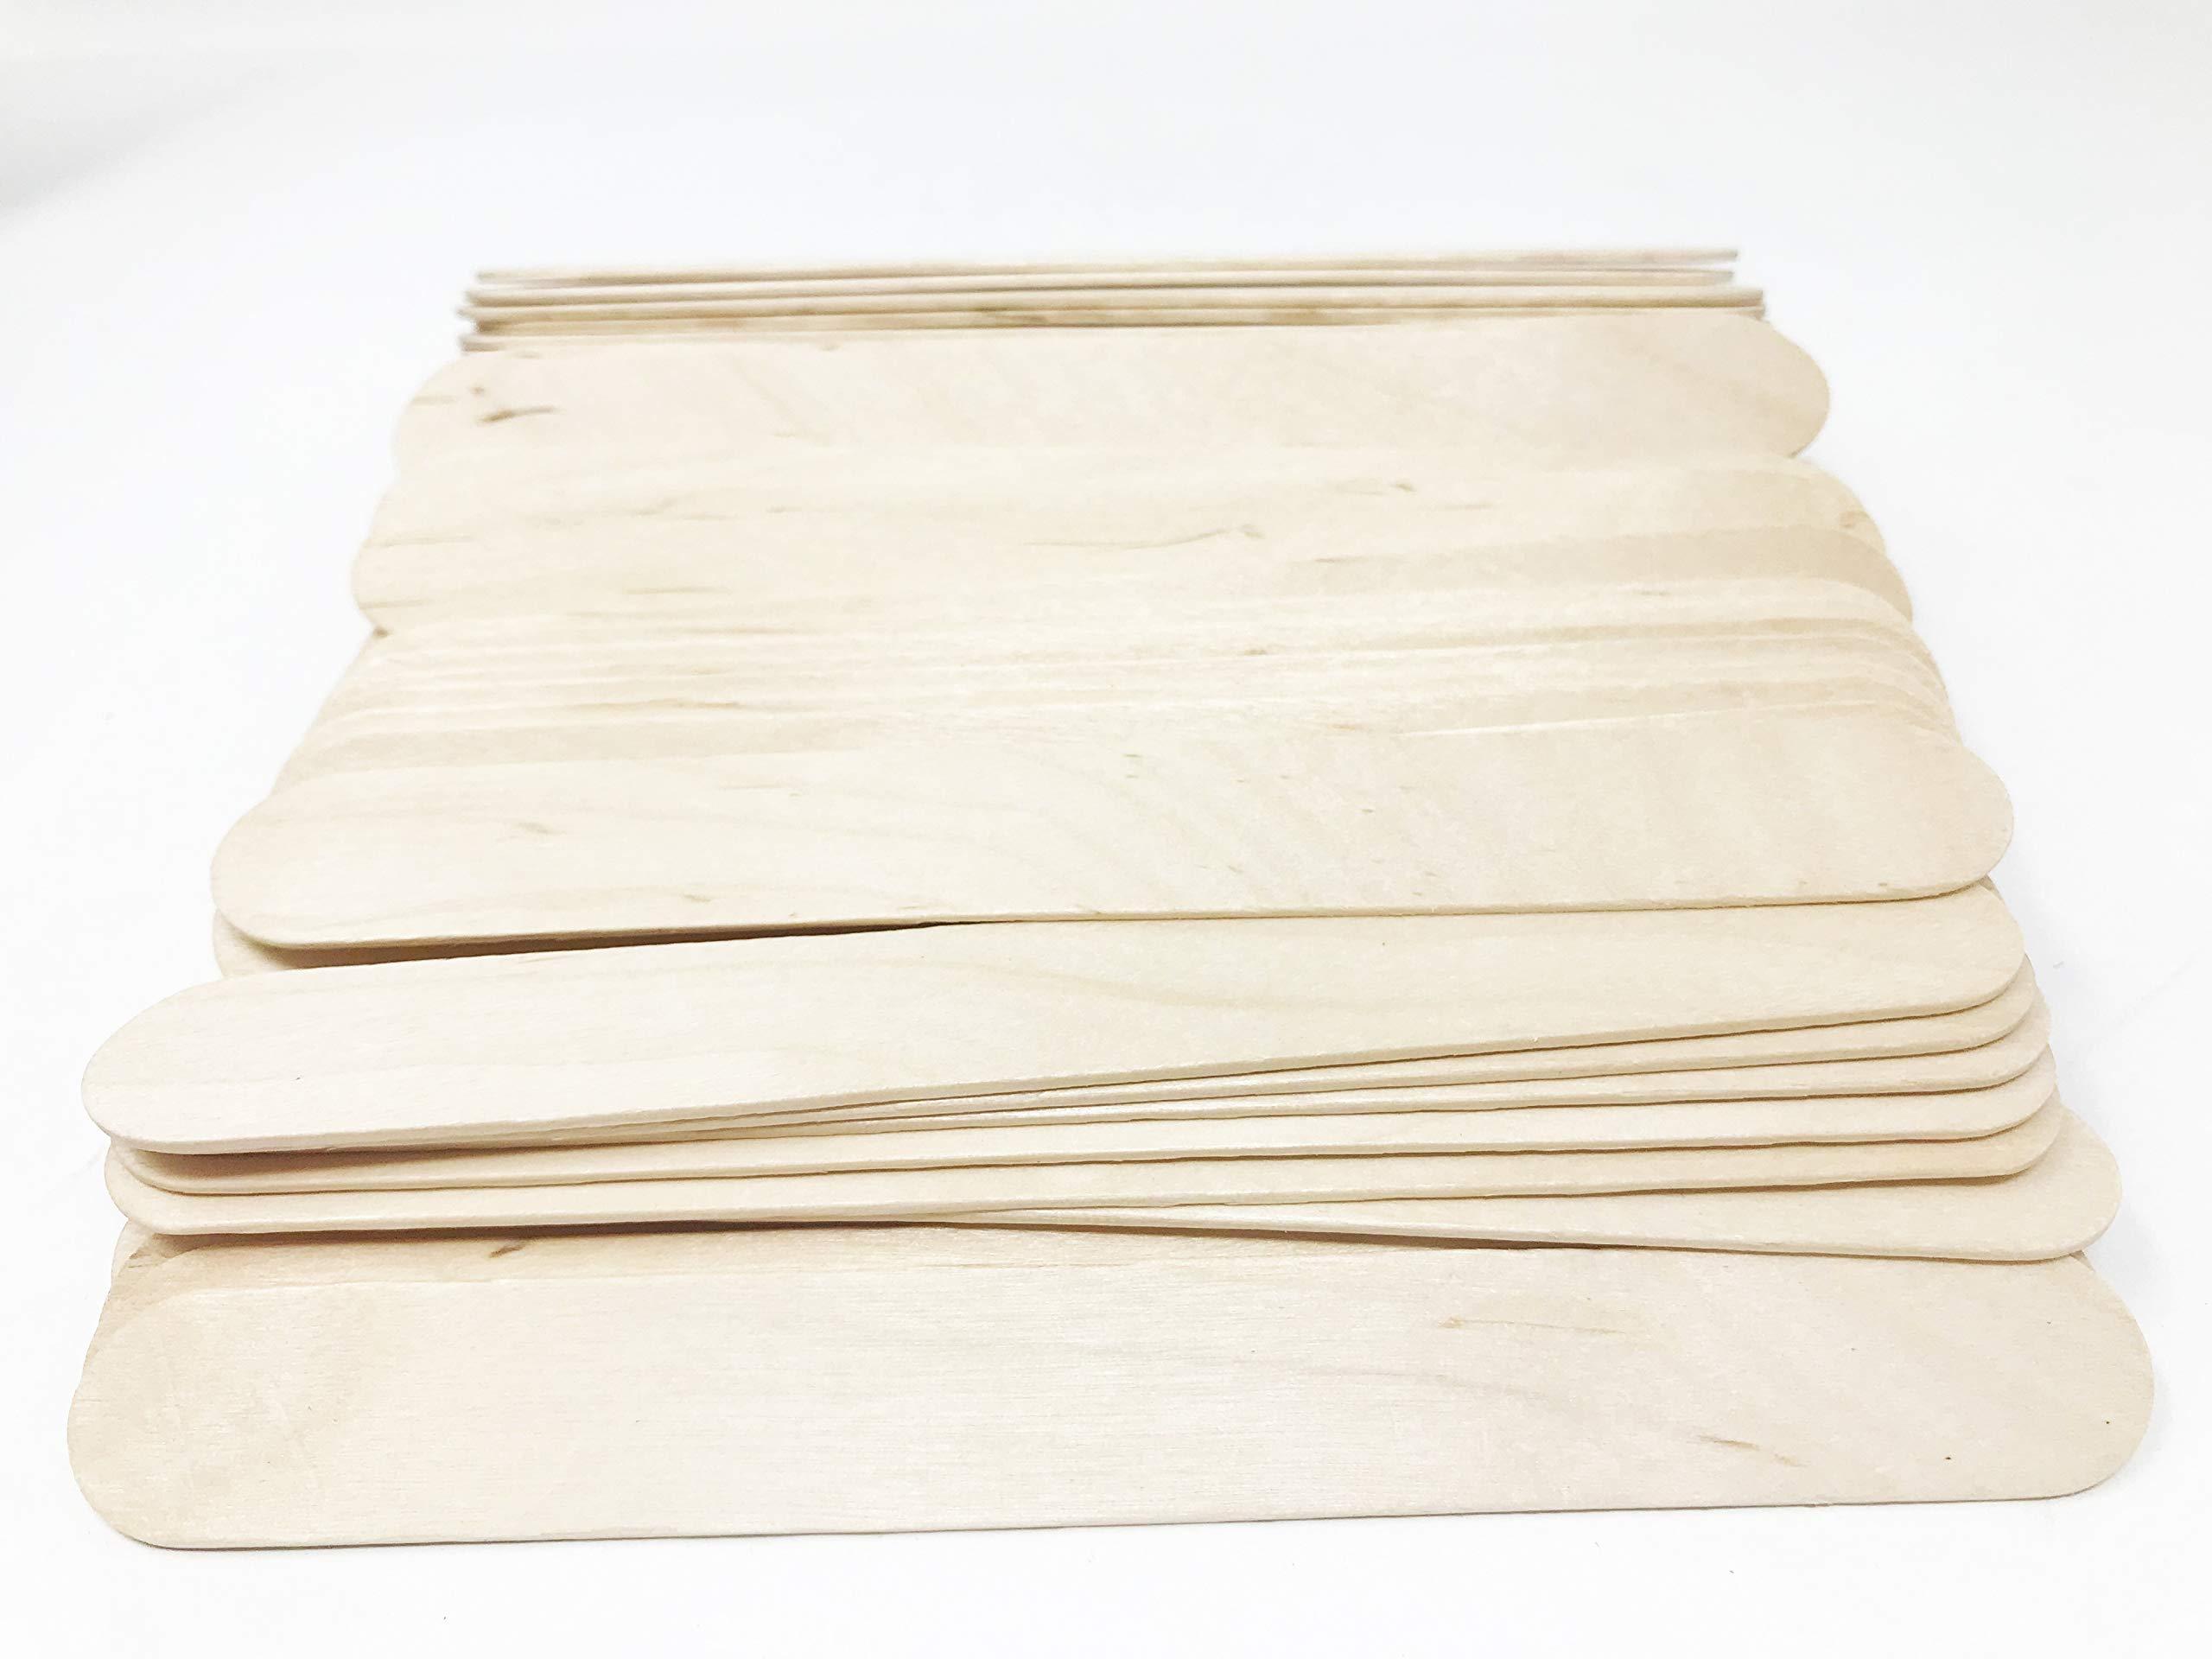 Tongue Depressors Non-STERILE Standard Size 6''x0.75'', Premium Natural Birch Wood Craft Sticks (2500 PCS (5 BX)) by Starryshine (Image #3)